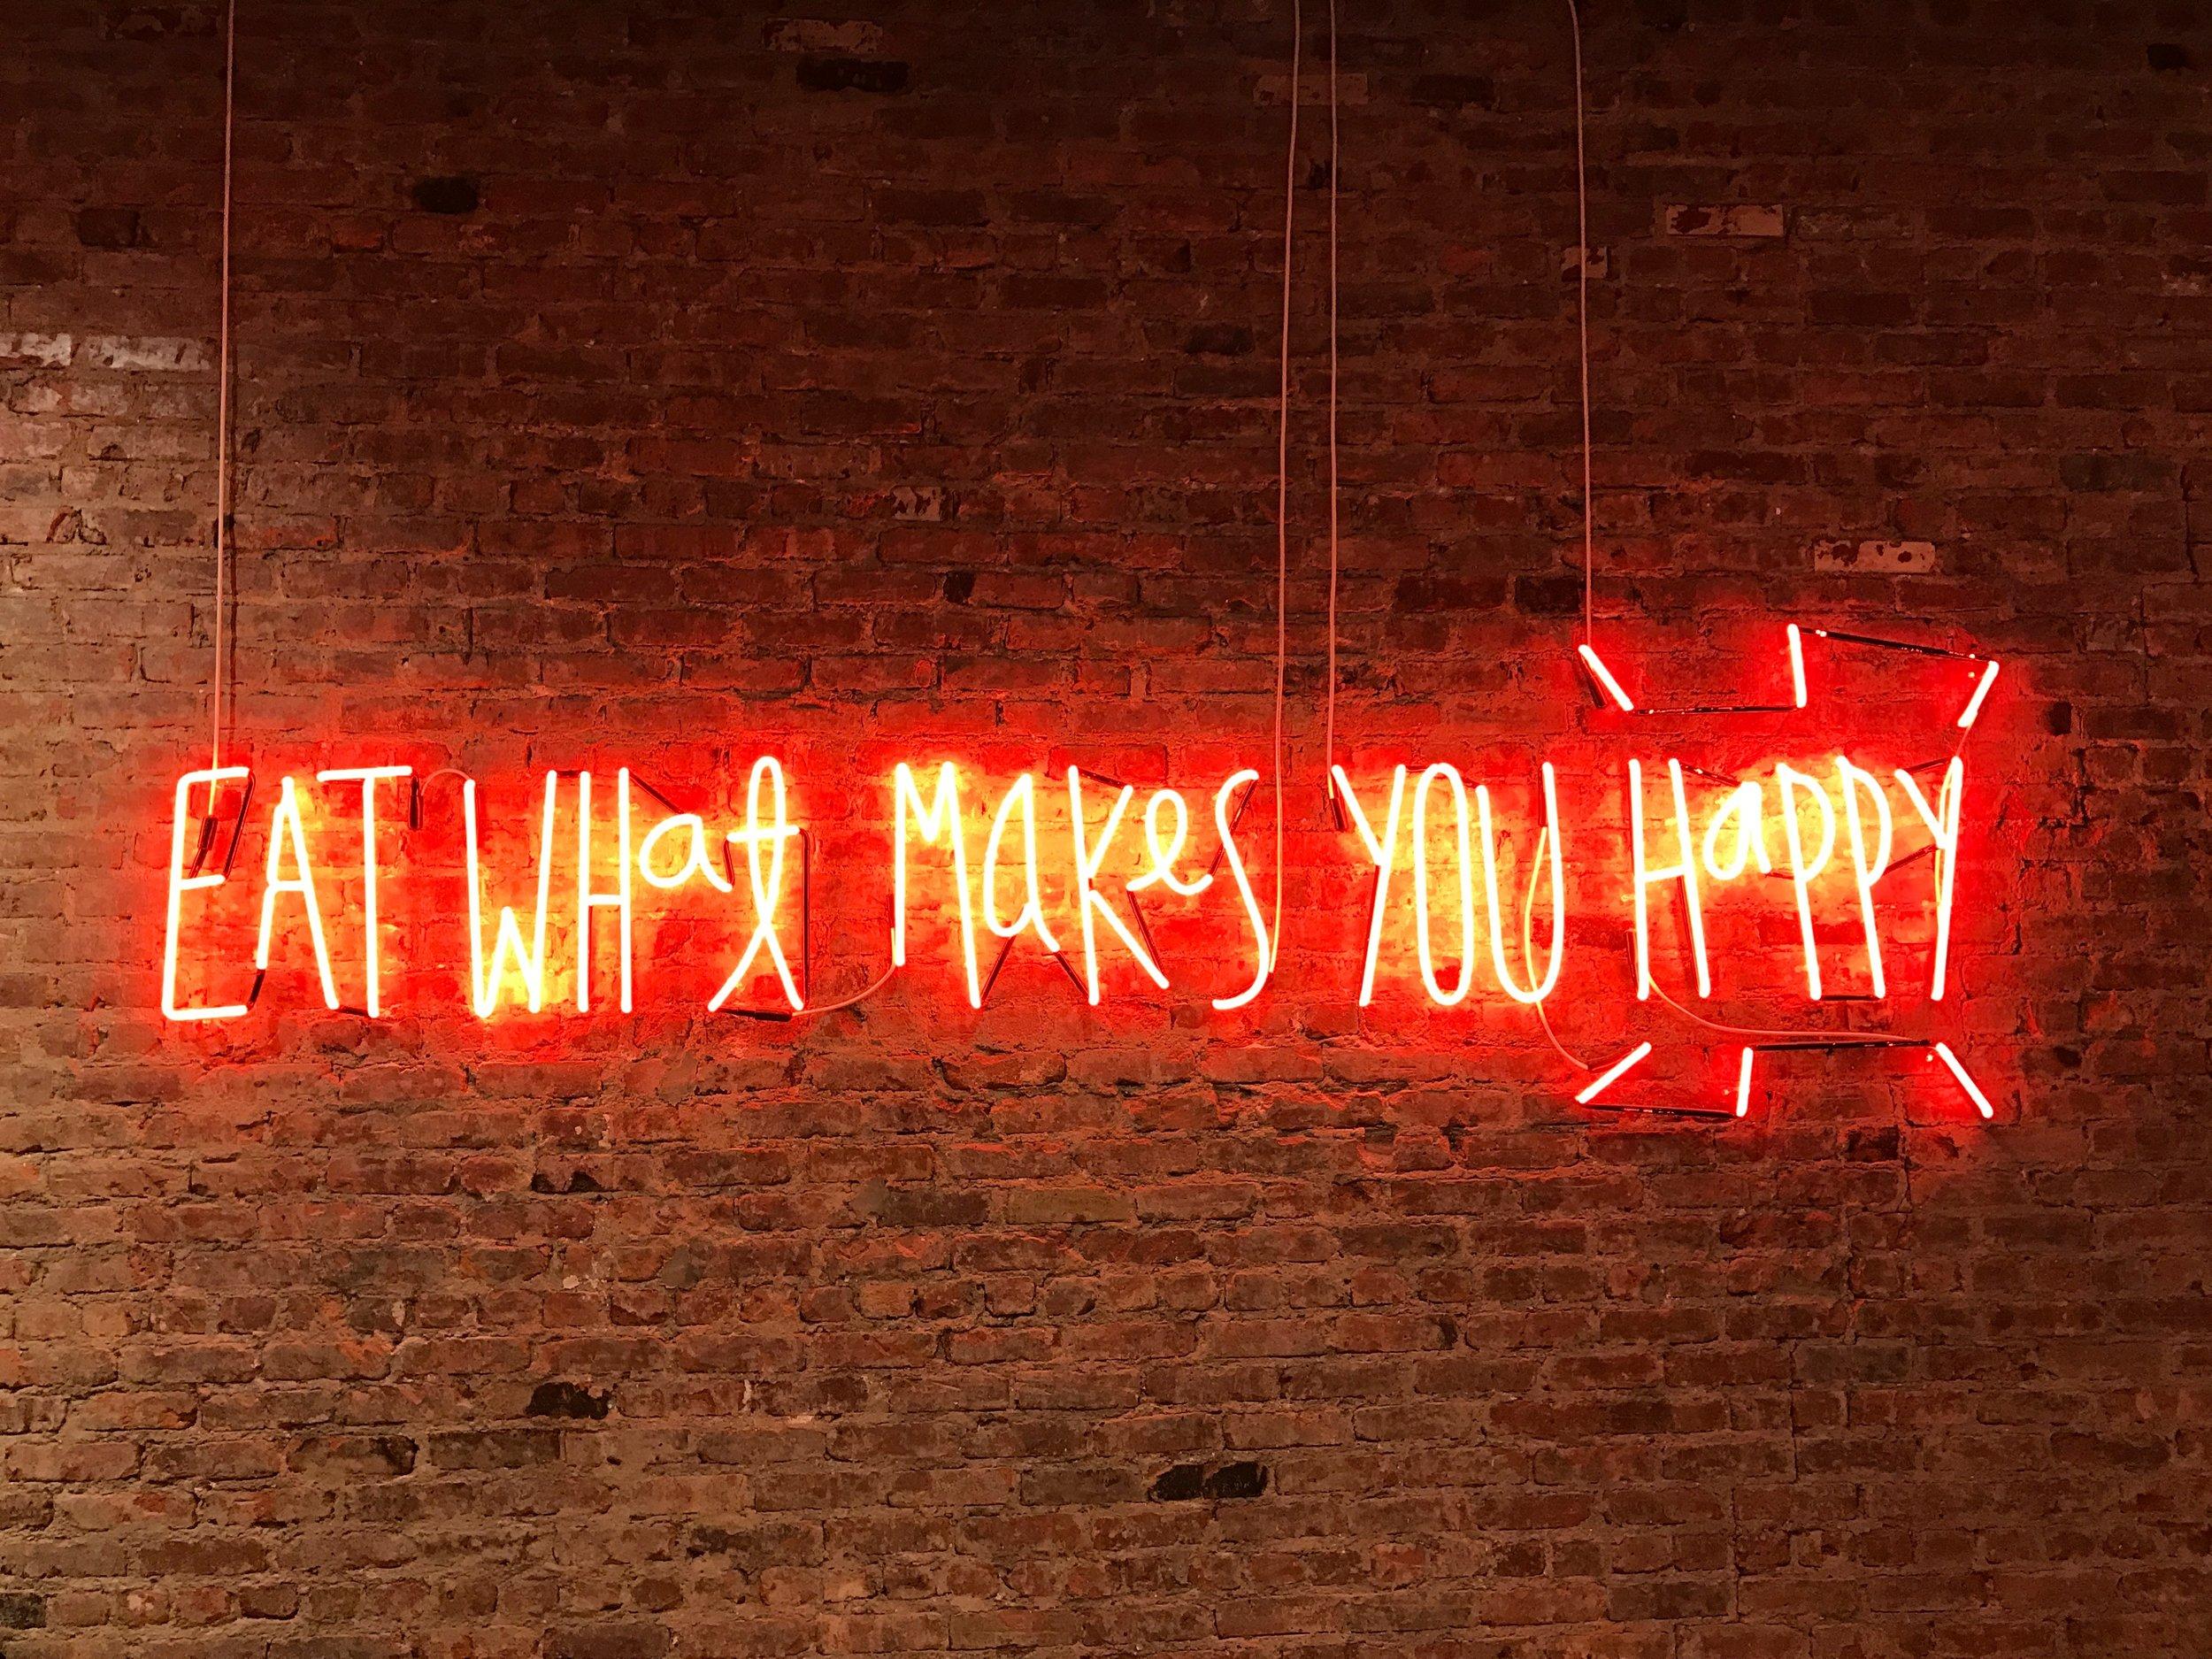 Eat what makes you happy - jon-tyson-204115-unsplash.jpg